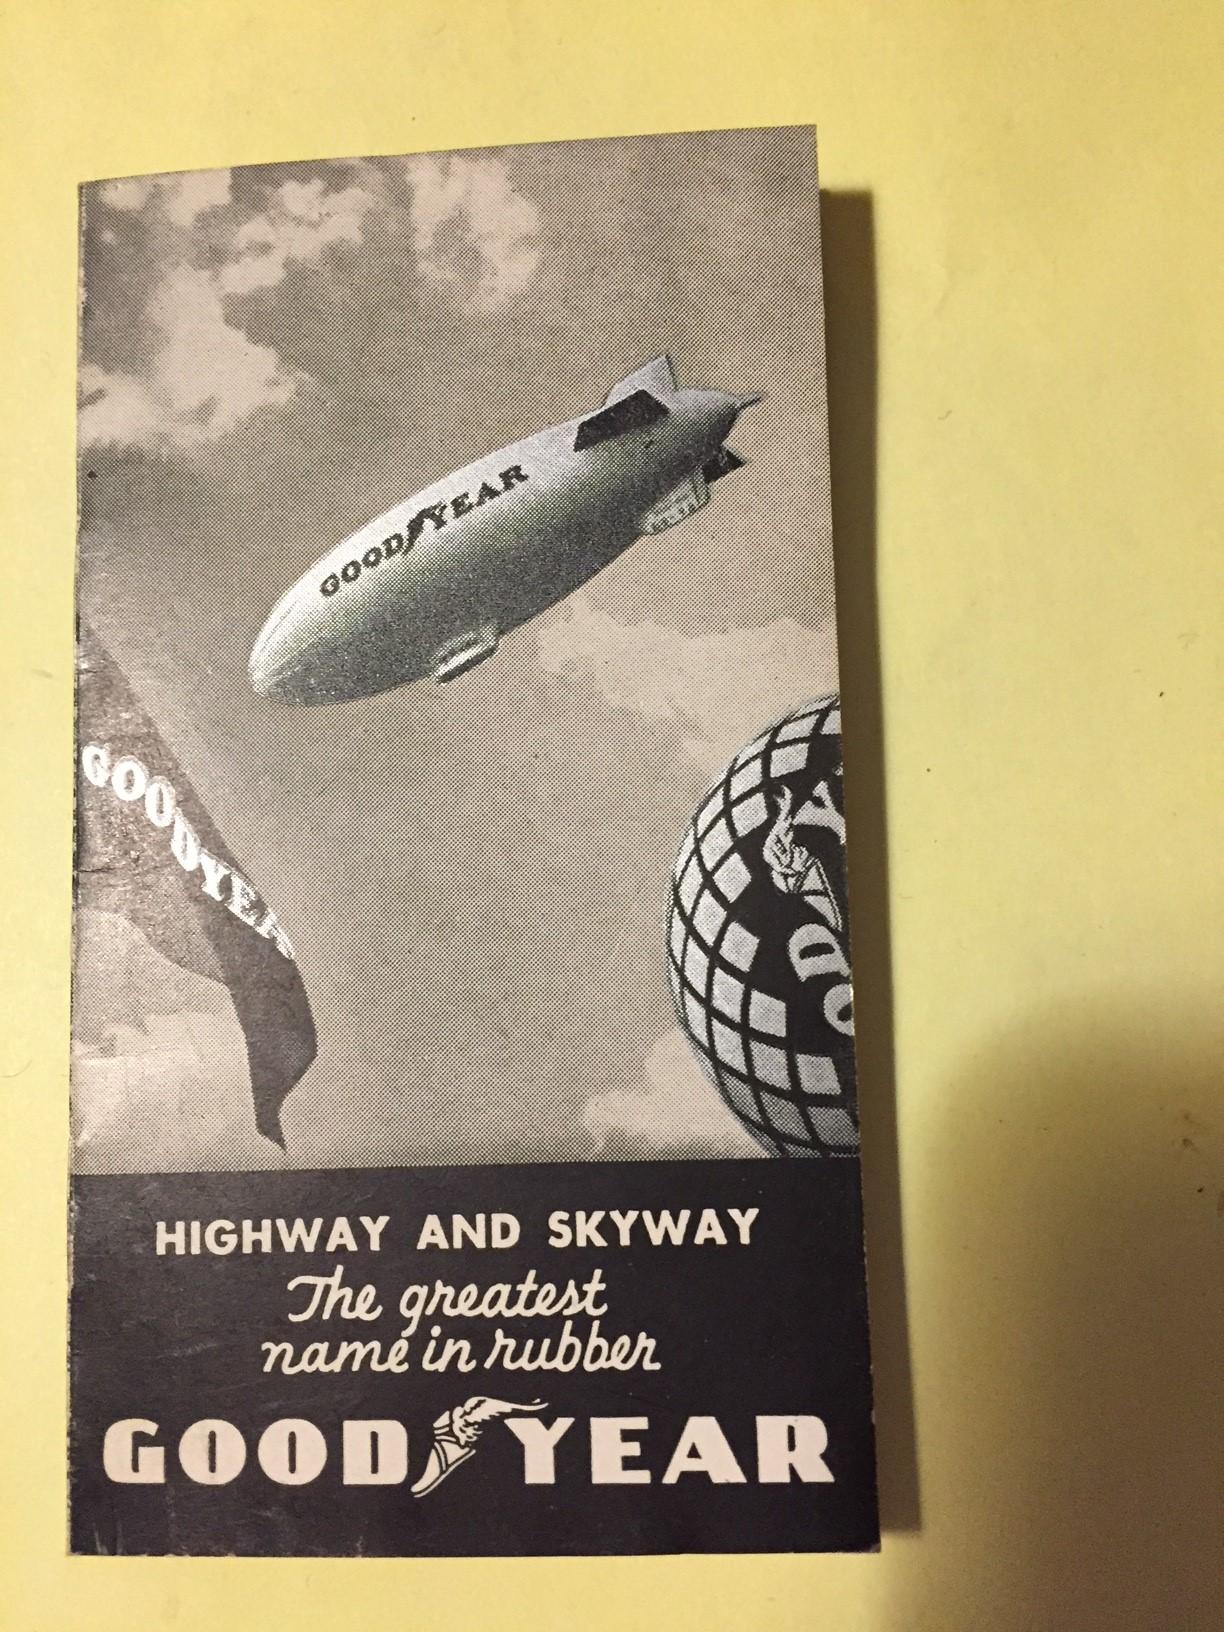 RARE 1934 FLIGHT LOG For Goodyear Airship Reliance